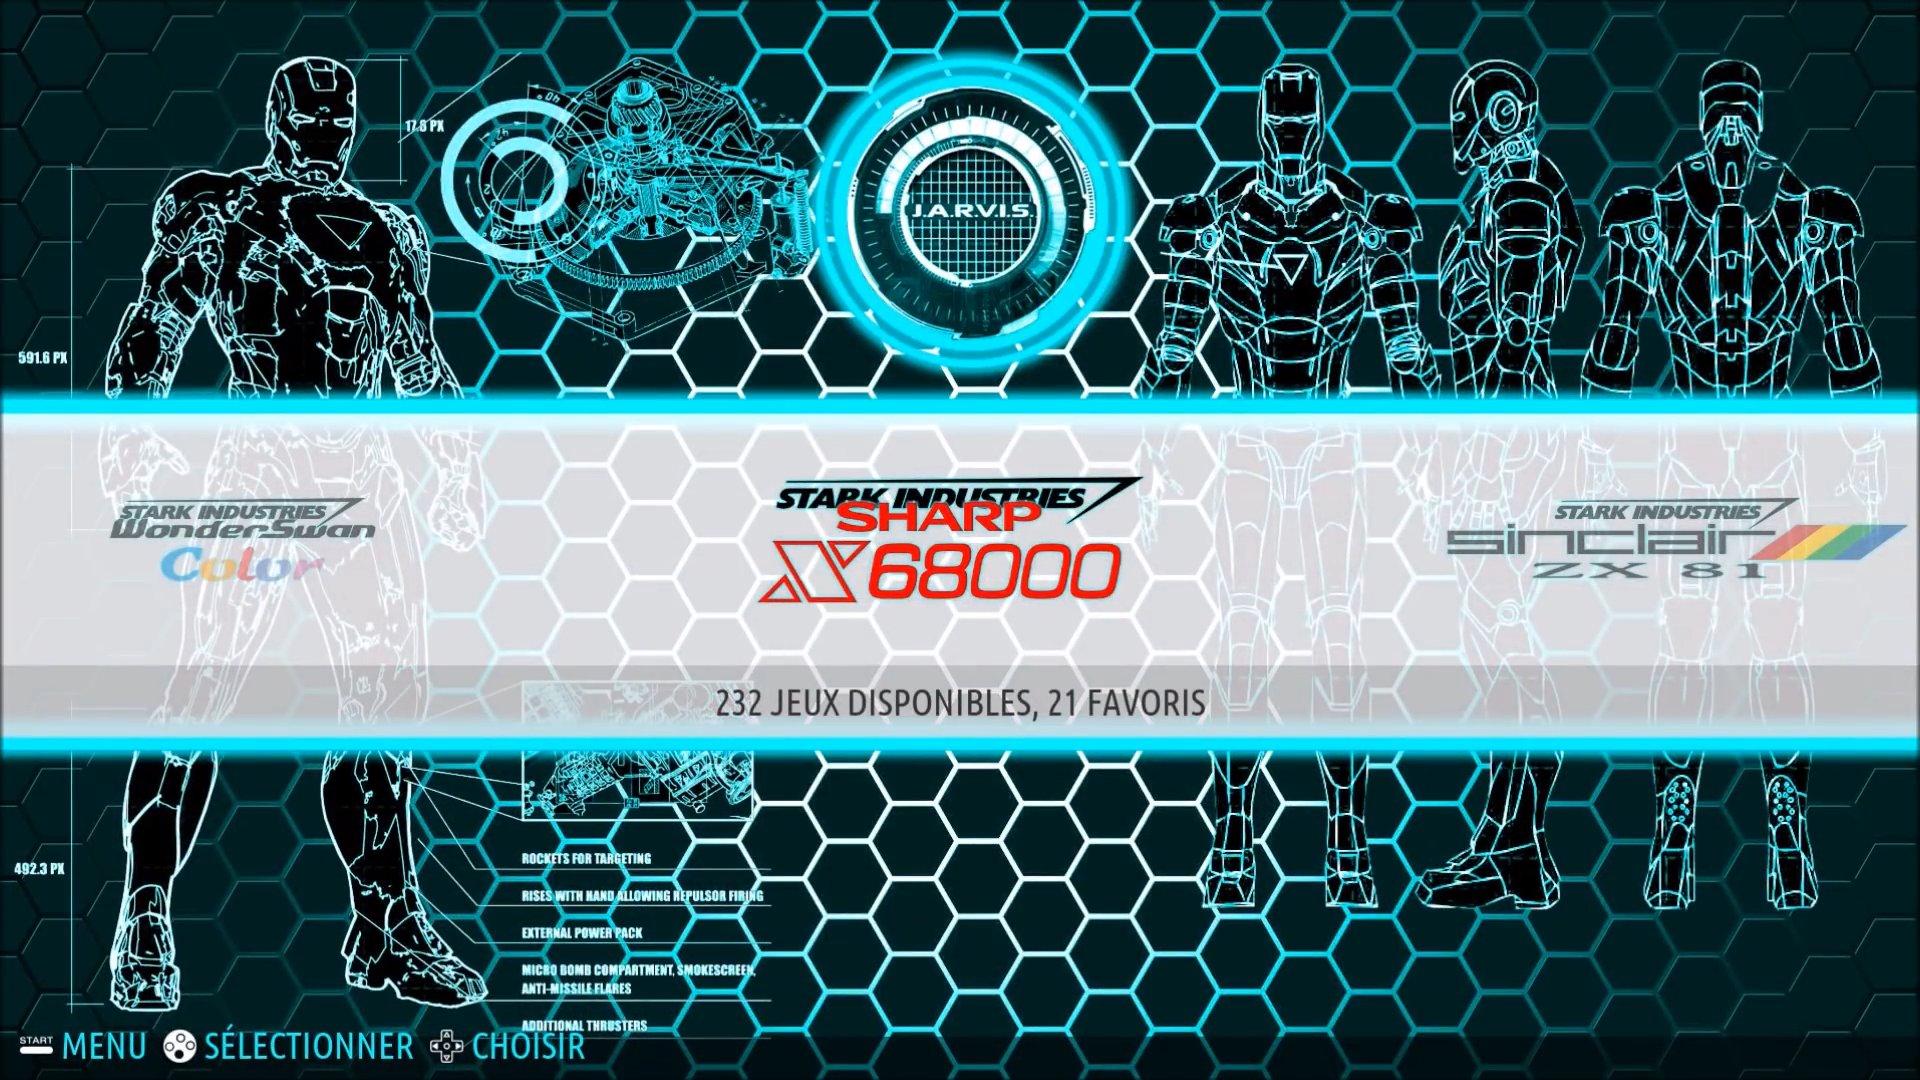 6_1519260692278_X68000.jpg